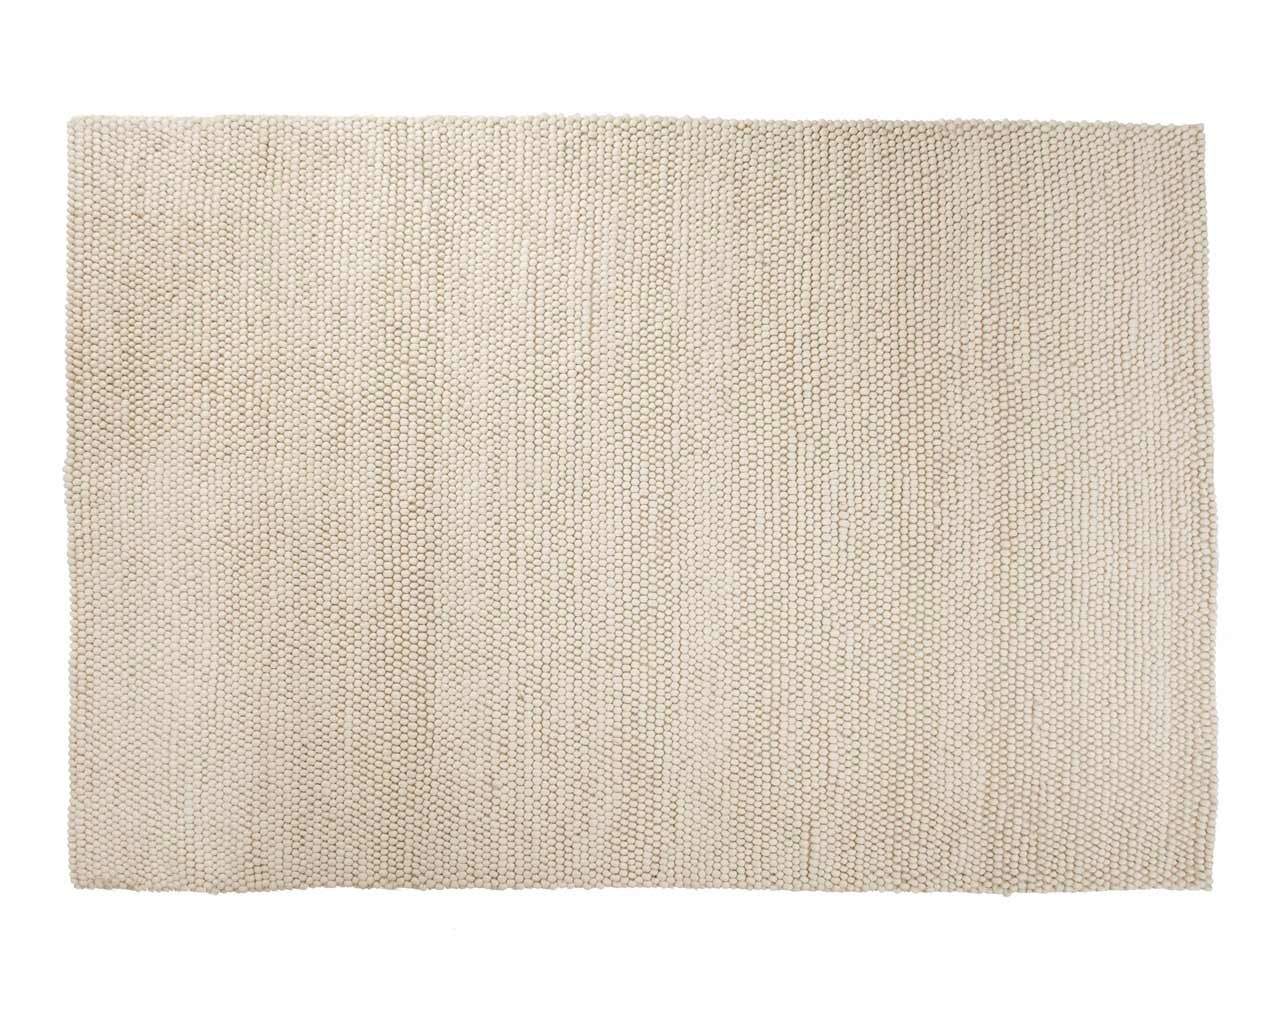 Beautiful White Woolen Rug Handmade In India Fair Trade Large Regarding Large Wool Area Rugs (#5 of 15)